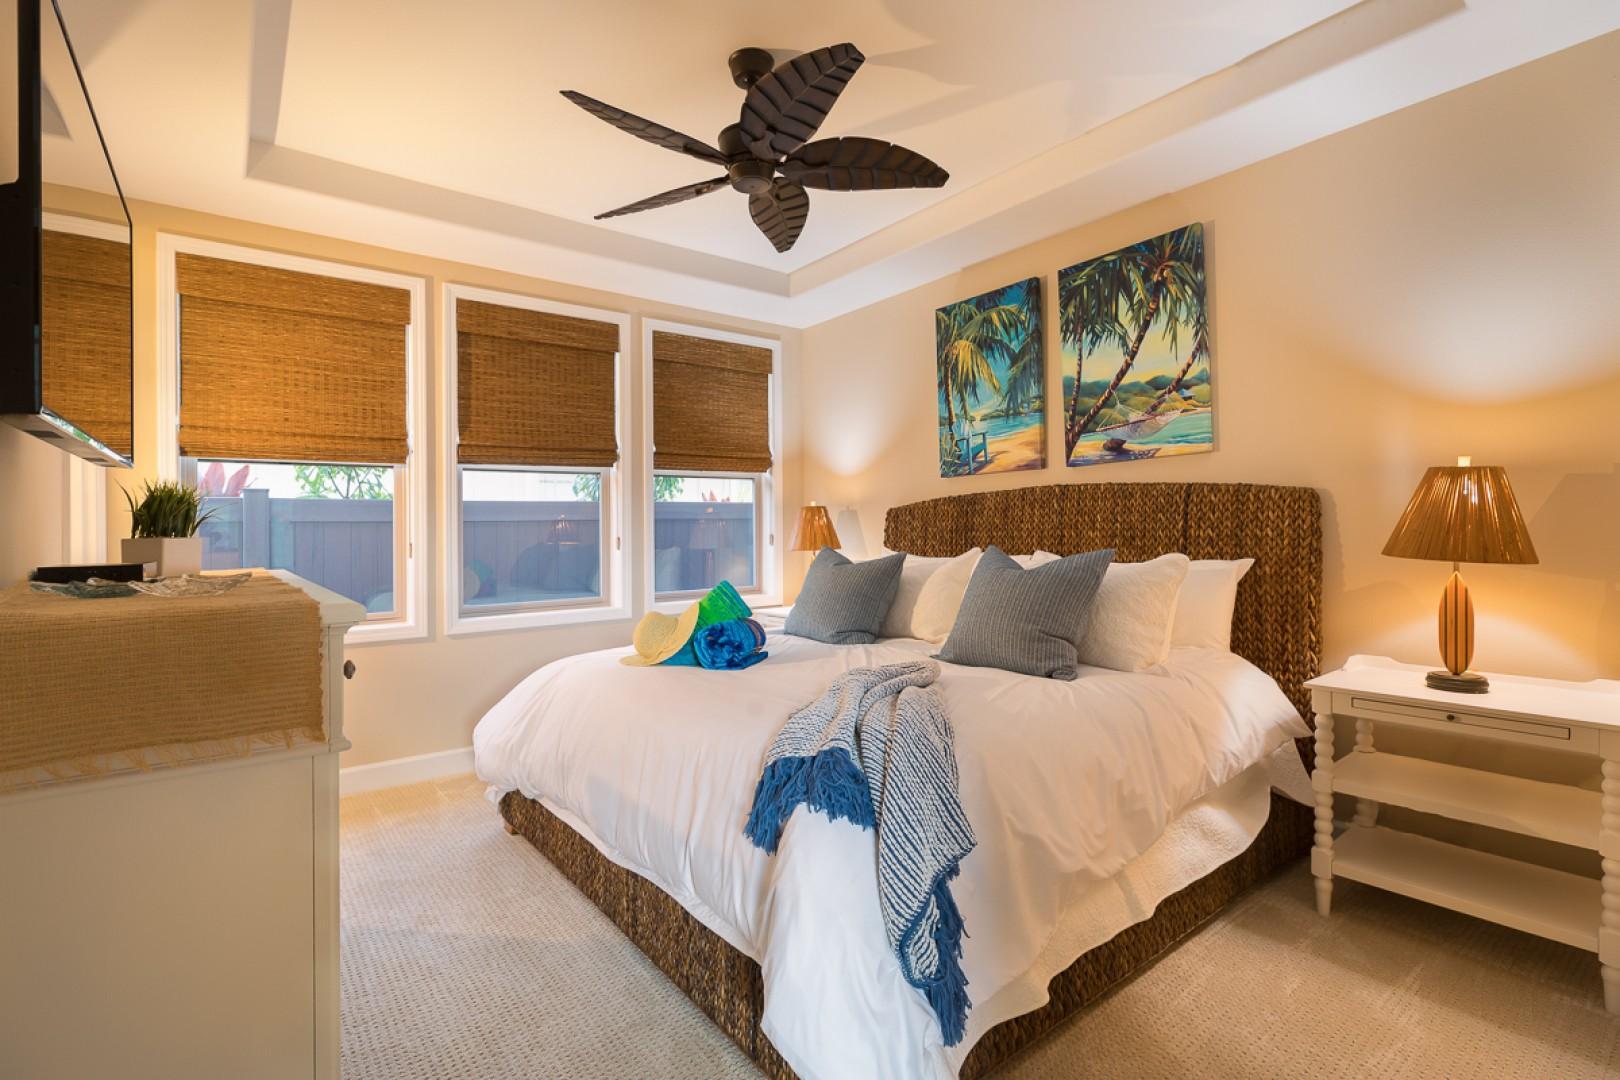 The third beautiful bedroom